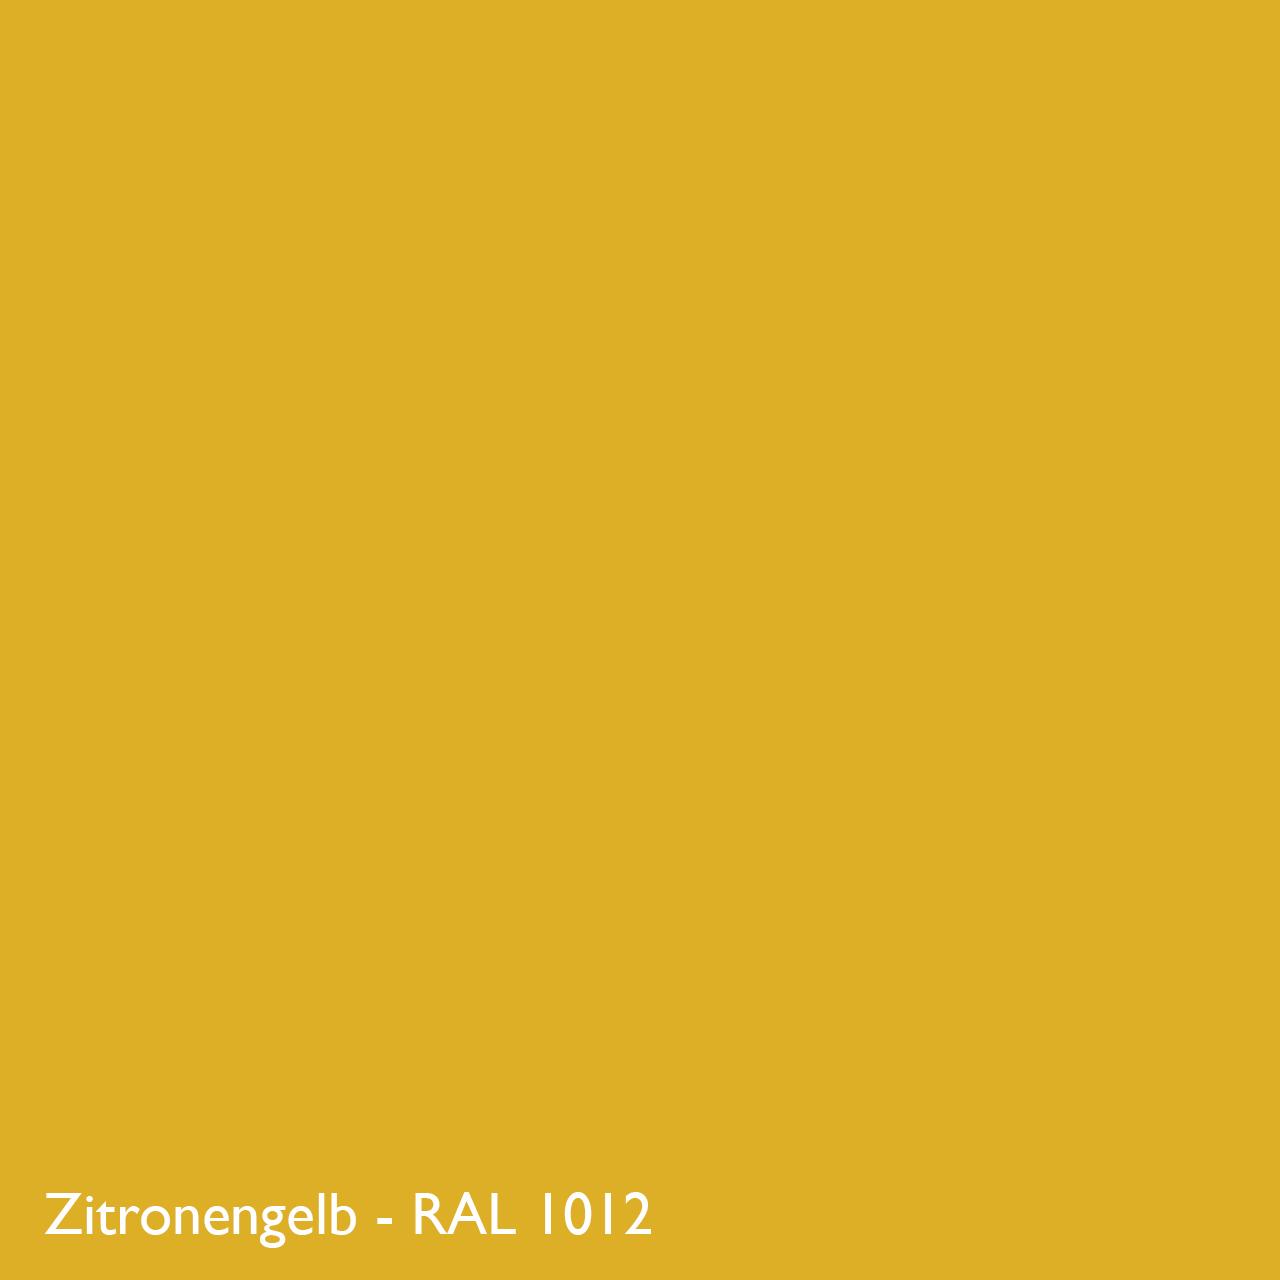 Farbkachel Manufakt Zitronengelb - RAL 1012